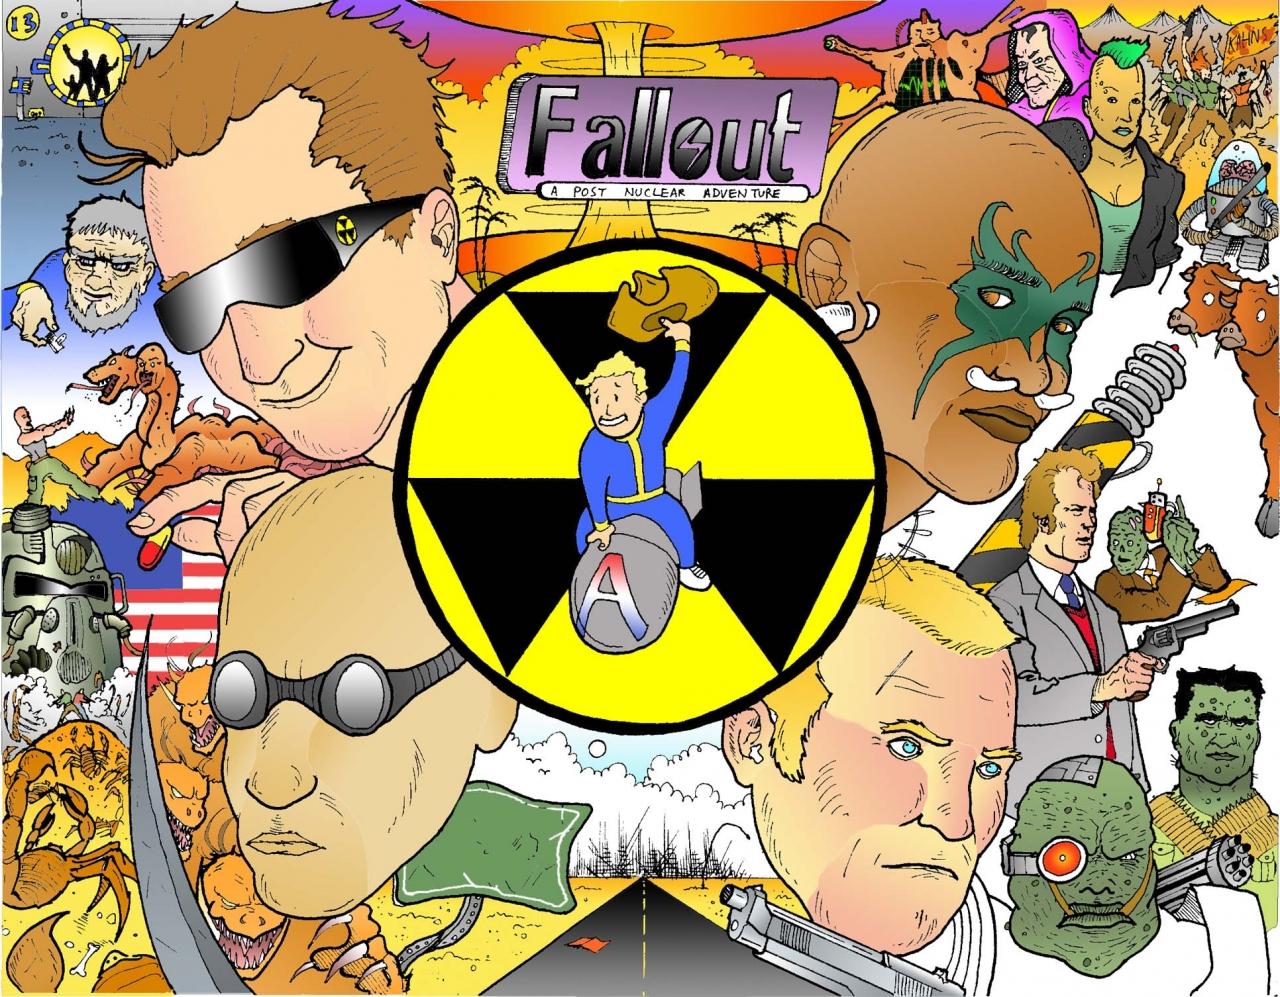 Fallout is the SHIZNIK!